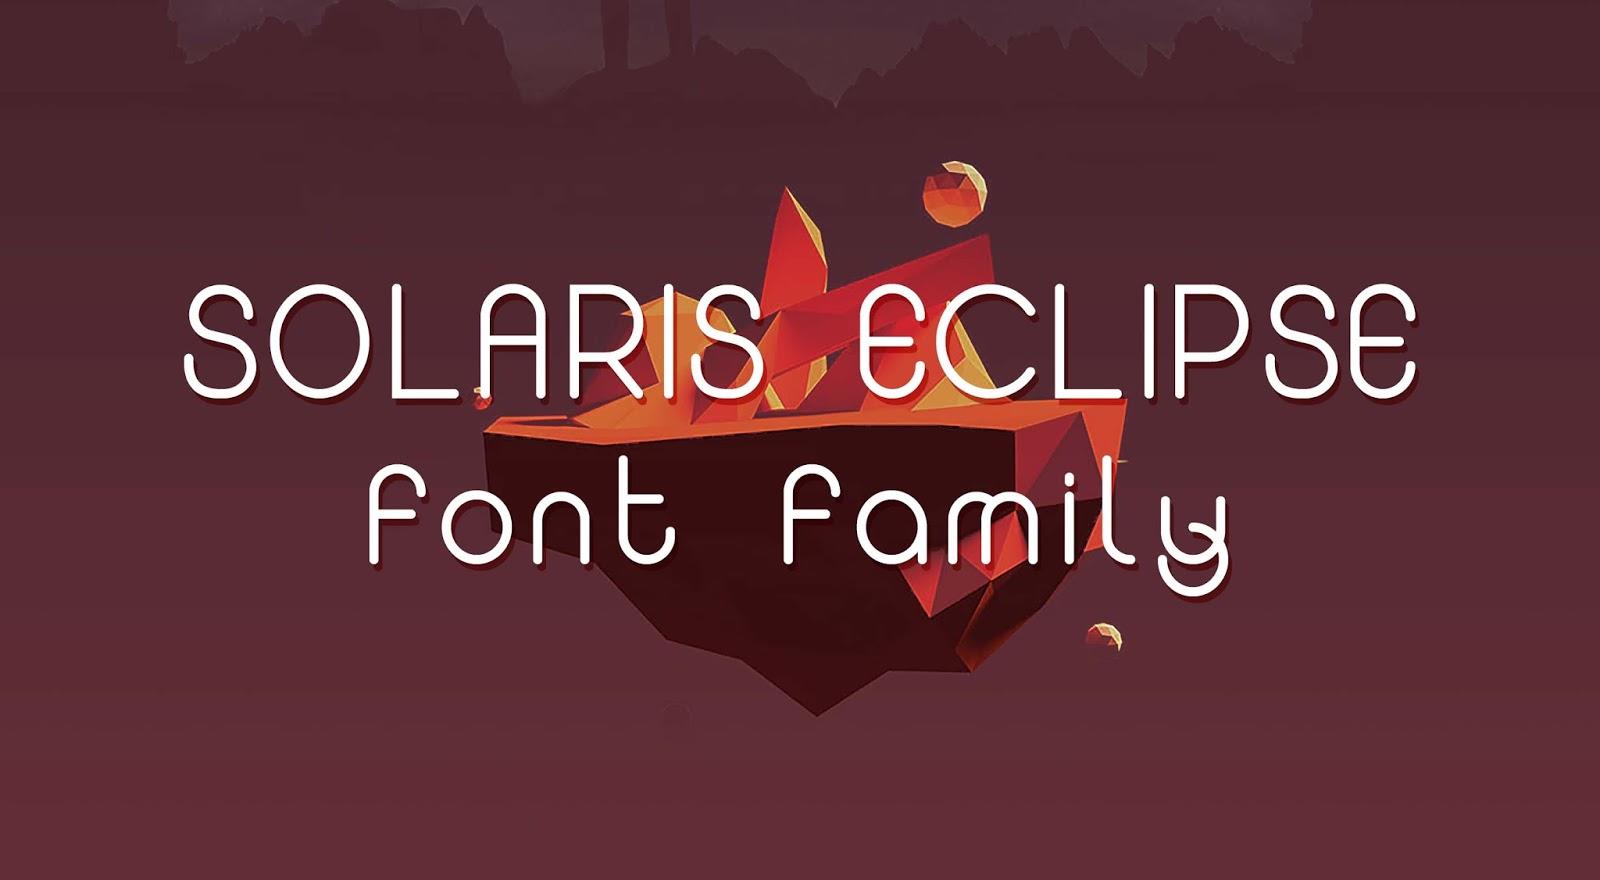 Font gratis terbaru - Solaris Eclipse Free Font